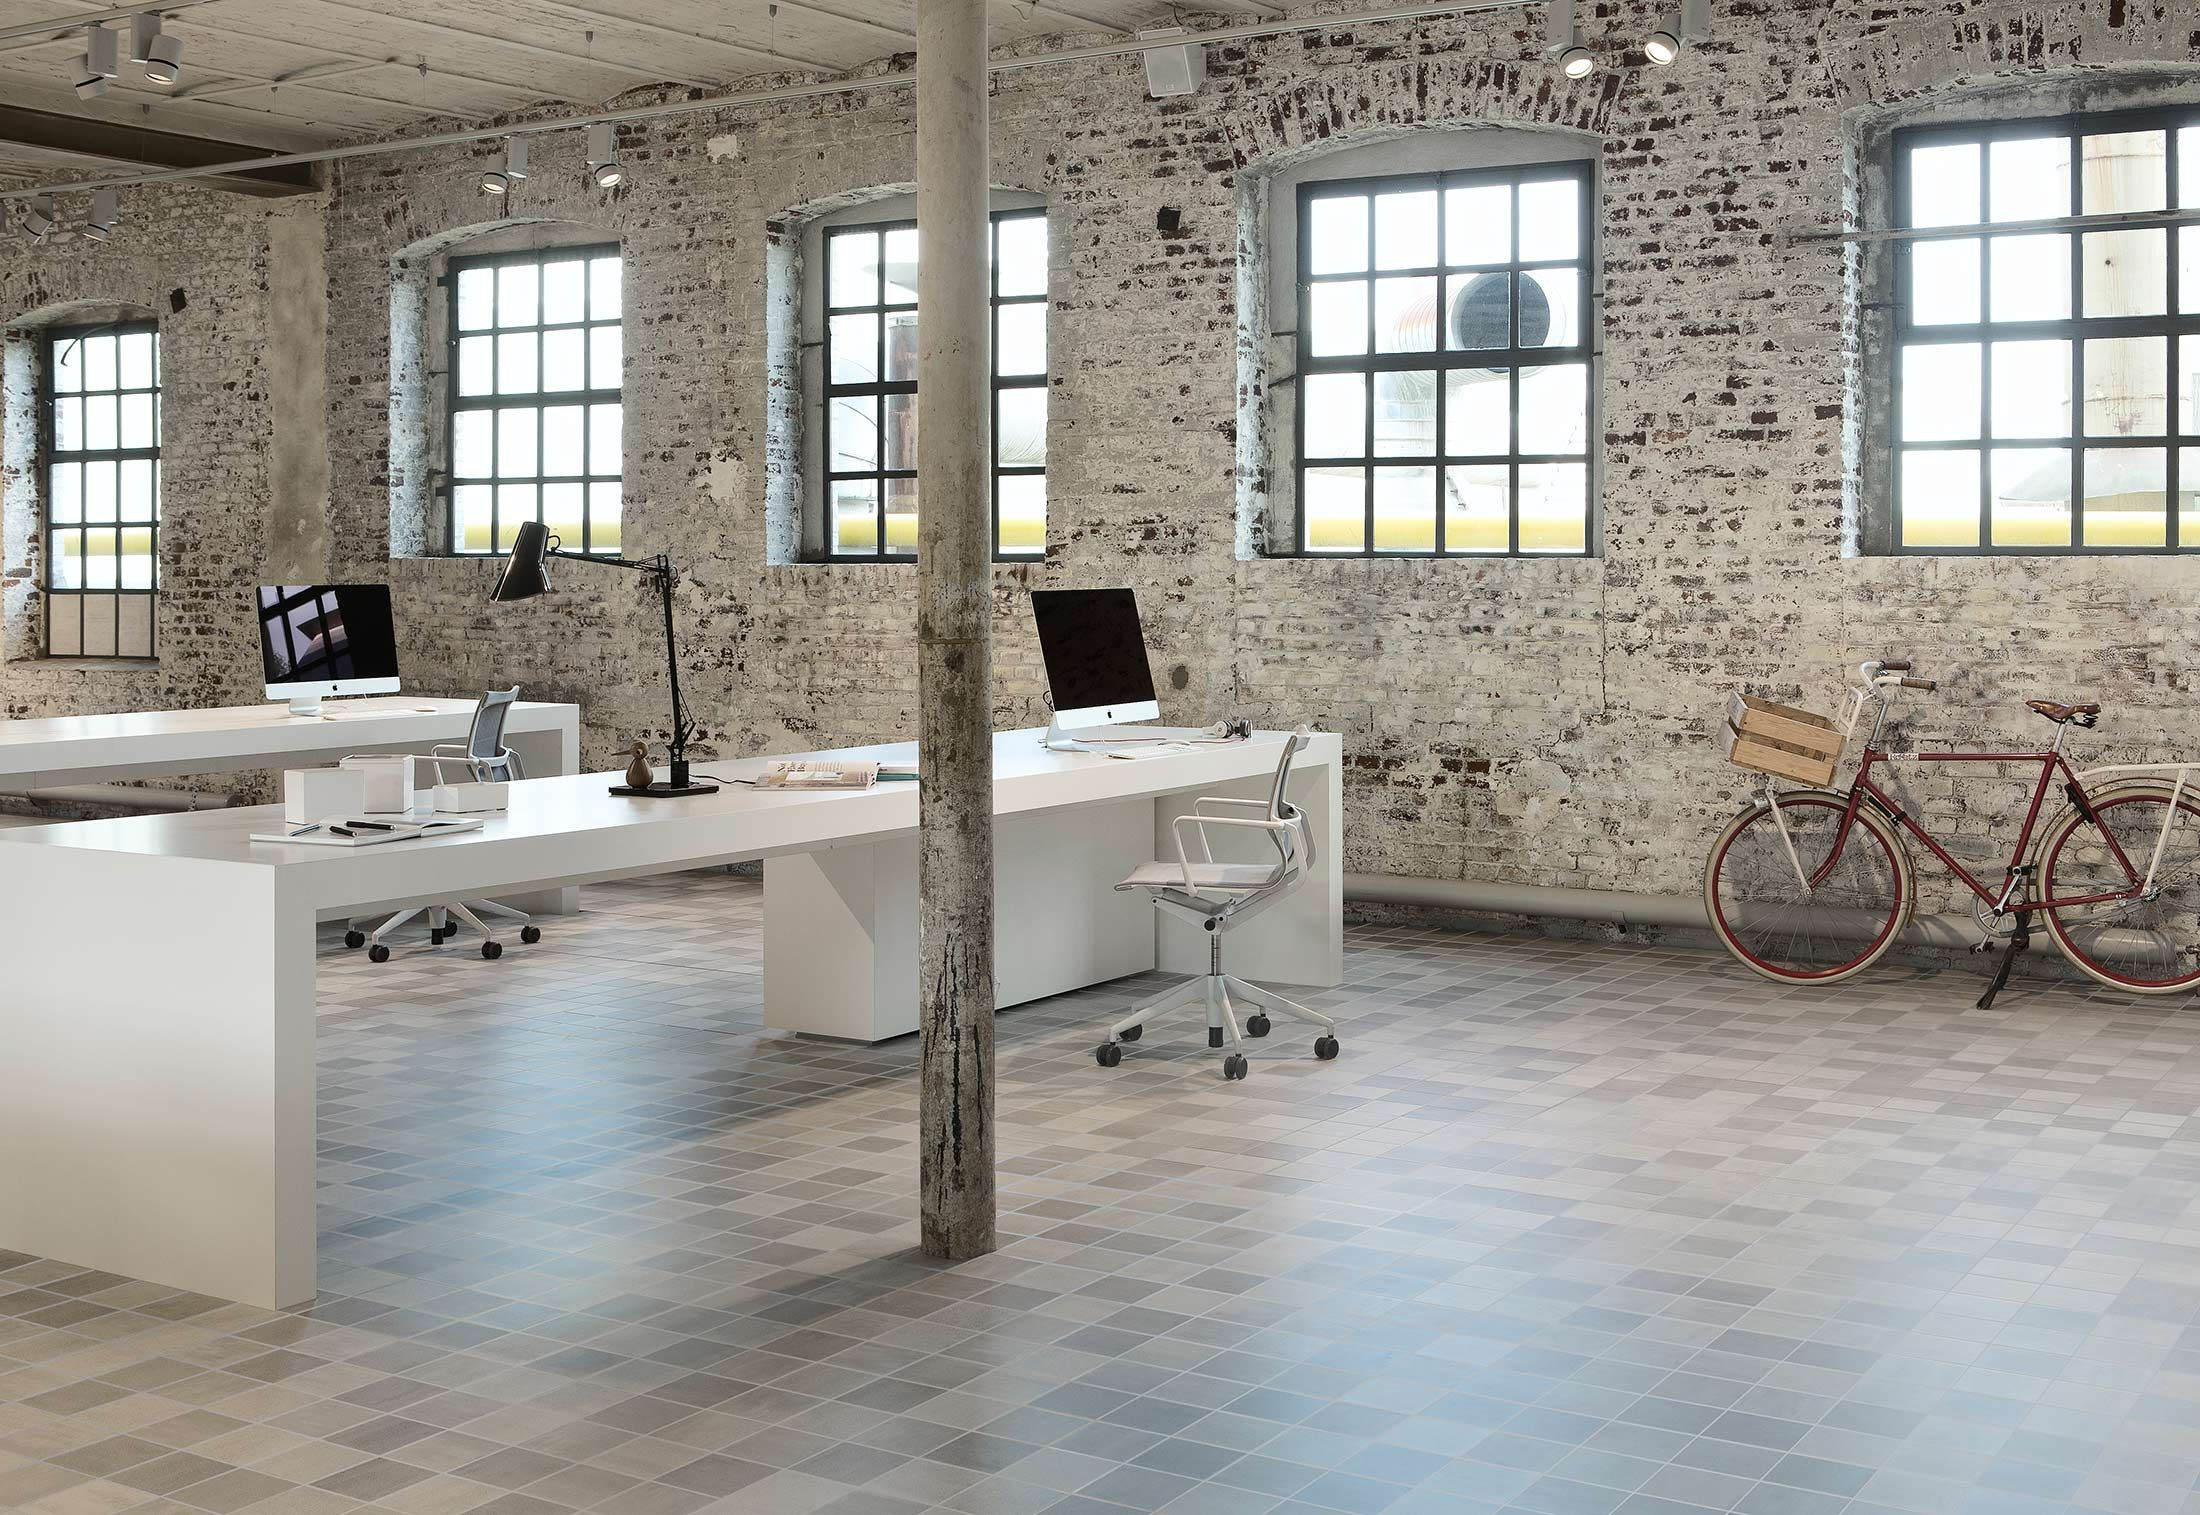 Vloertegels Badkamer Mosa : Oude fabriekshal als inspirerende werkomgeving met vloertegels mosa